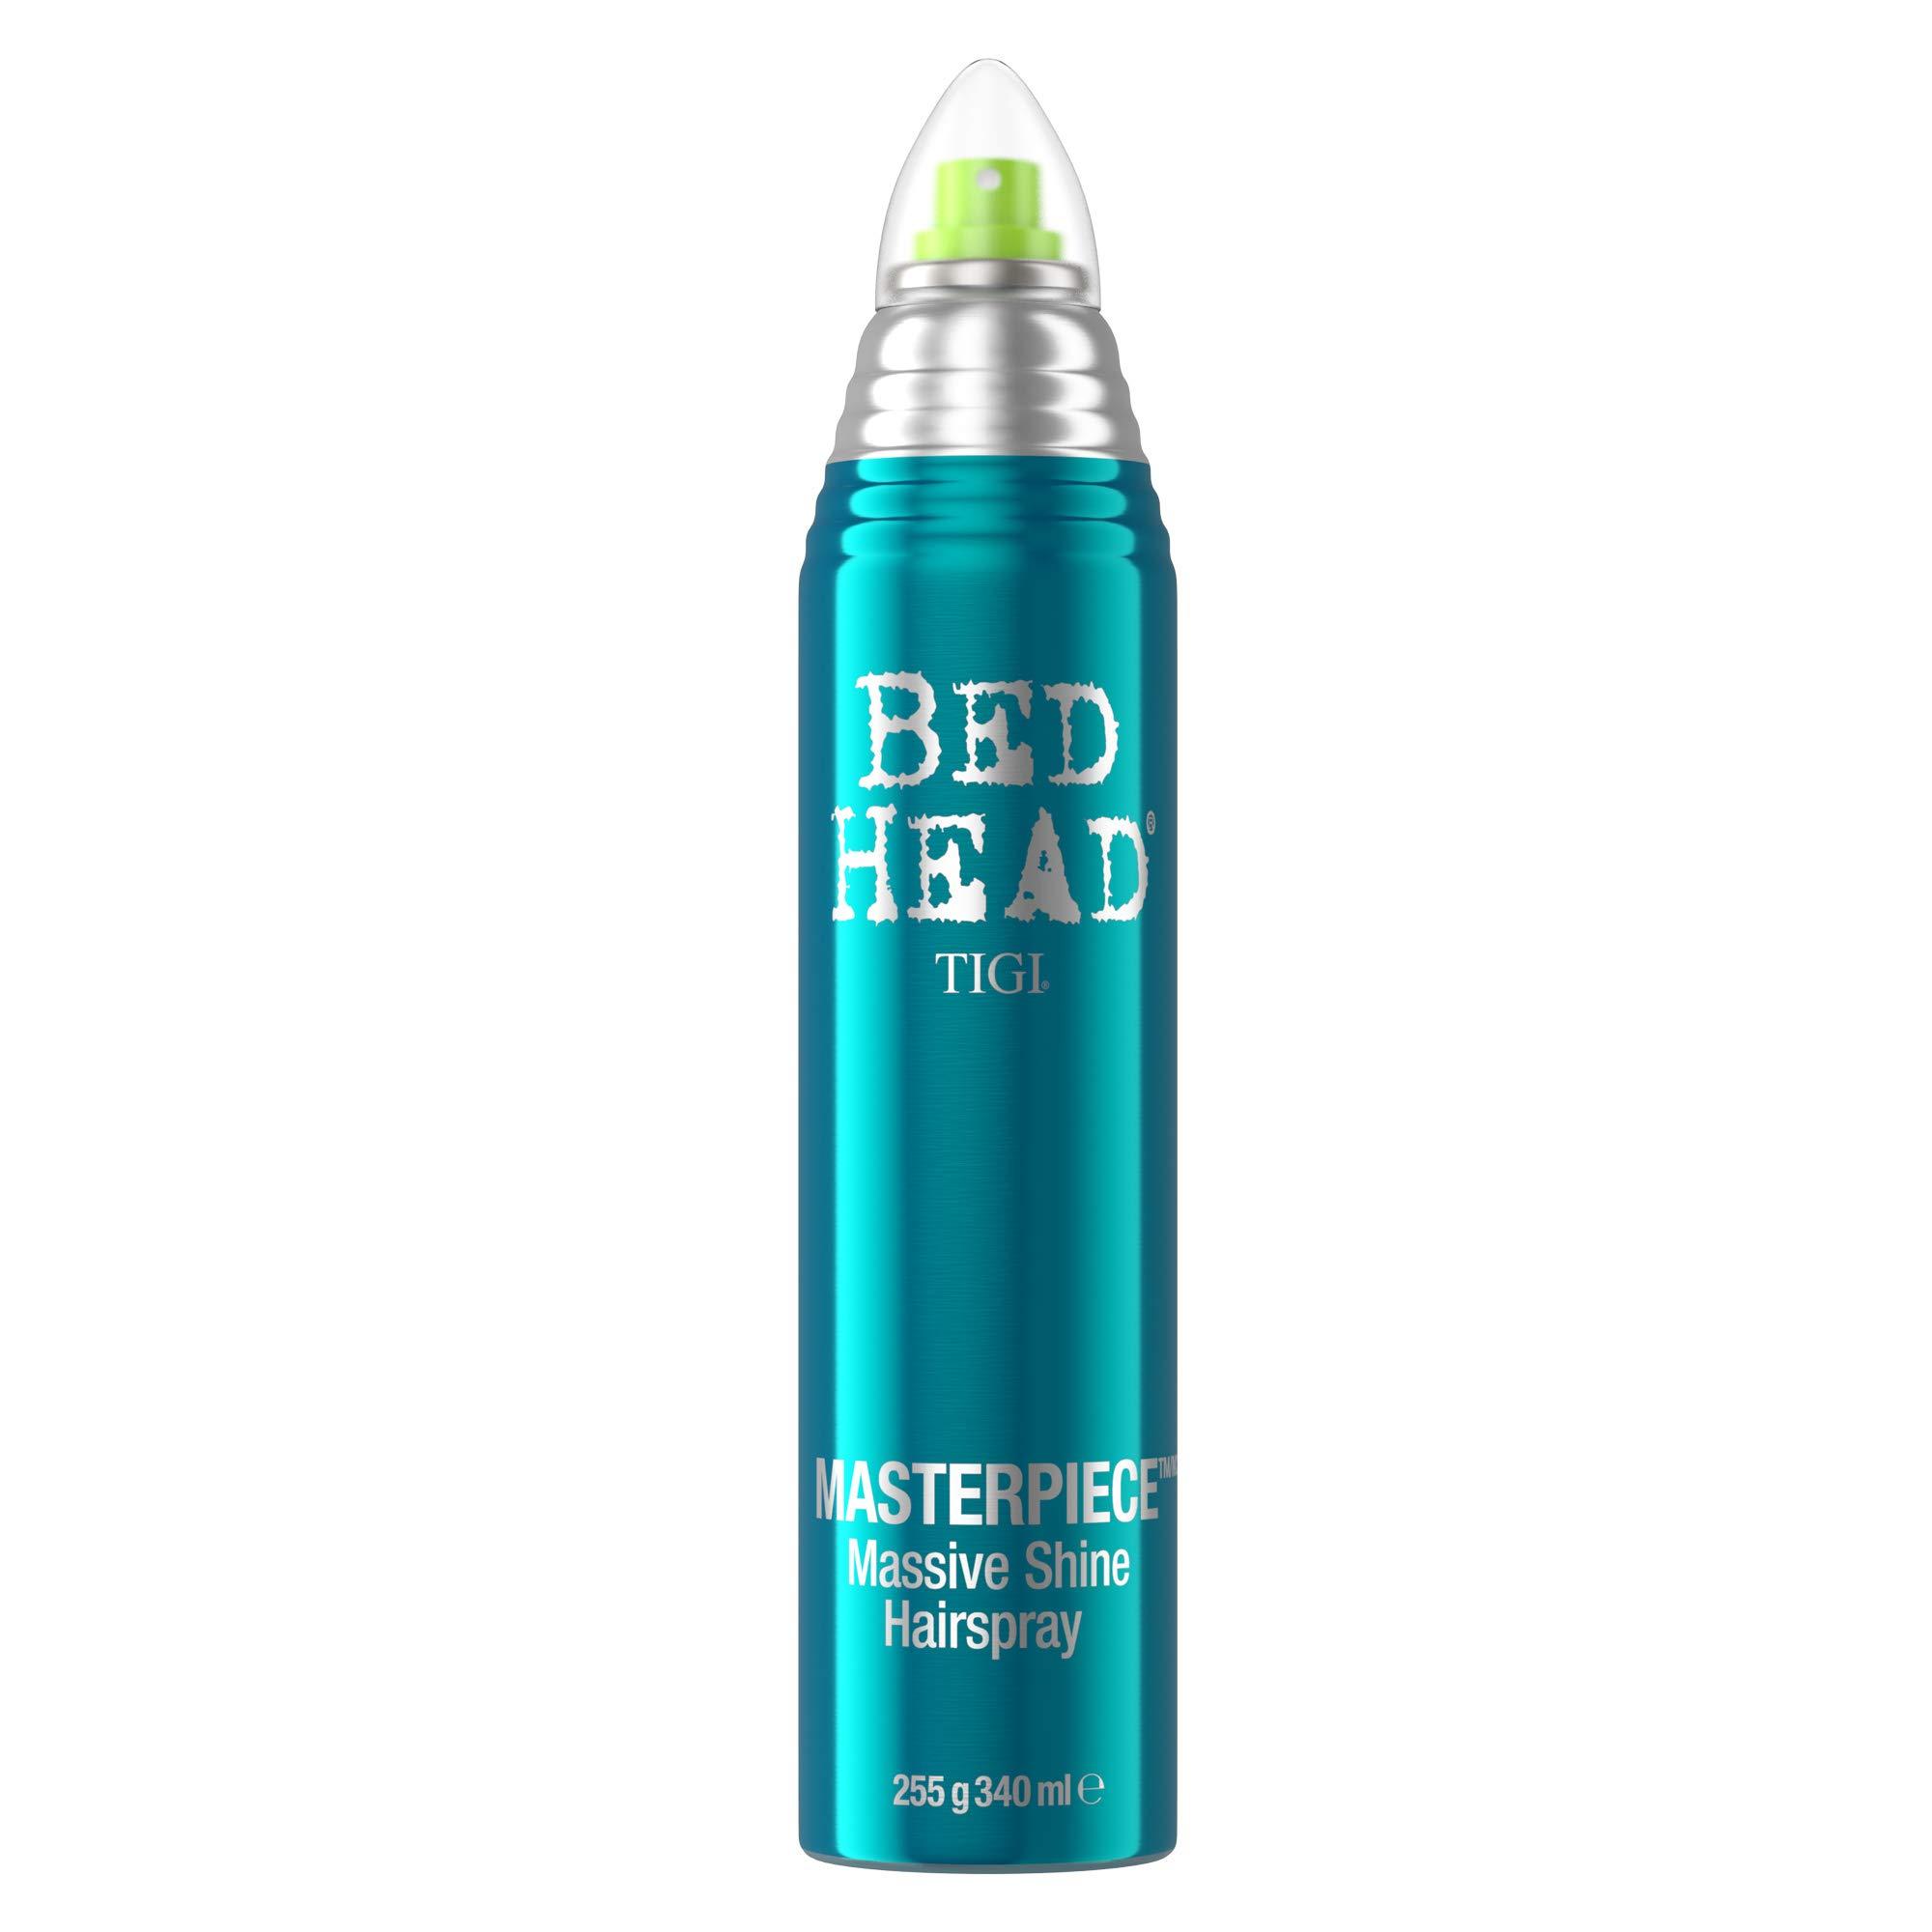 TIGI Bed Head Masterpiece Massive Shine Hairspray, 9.5 Ounce by TIGI